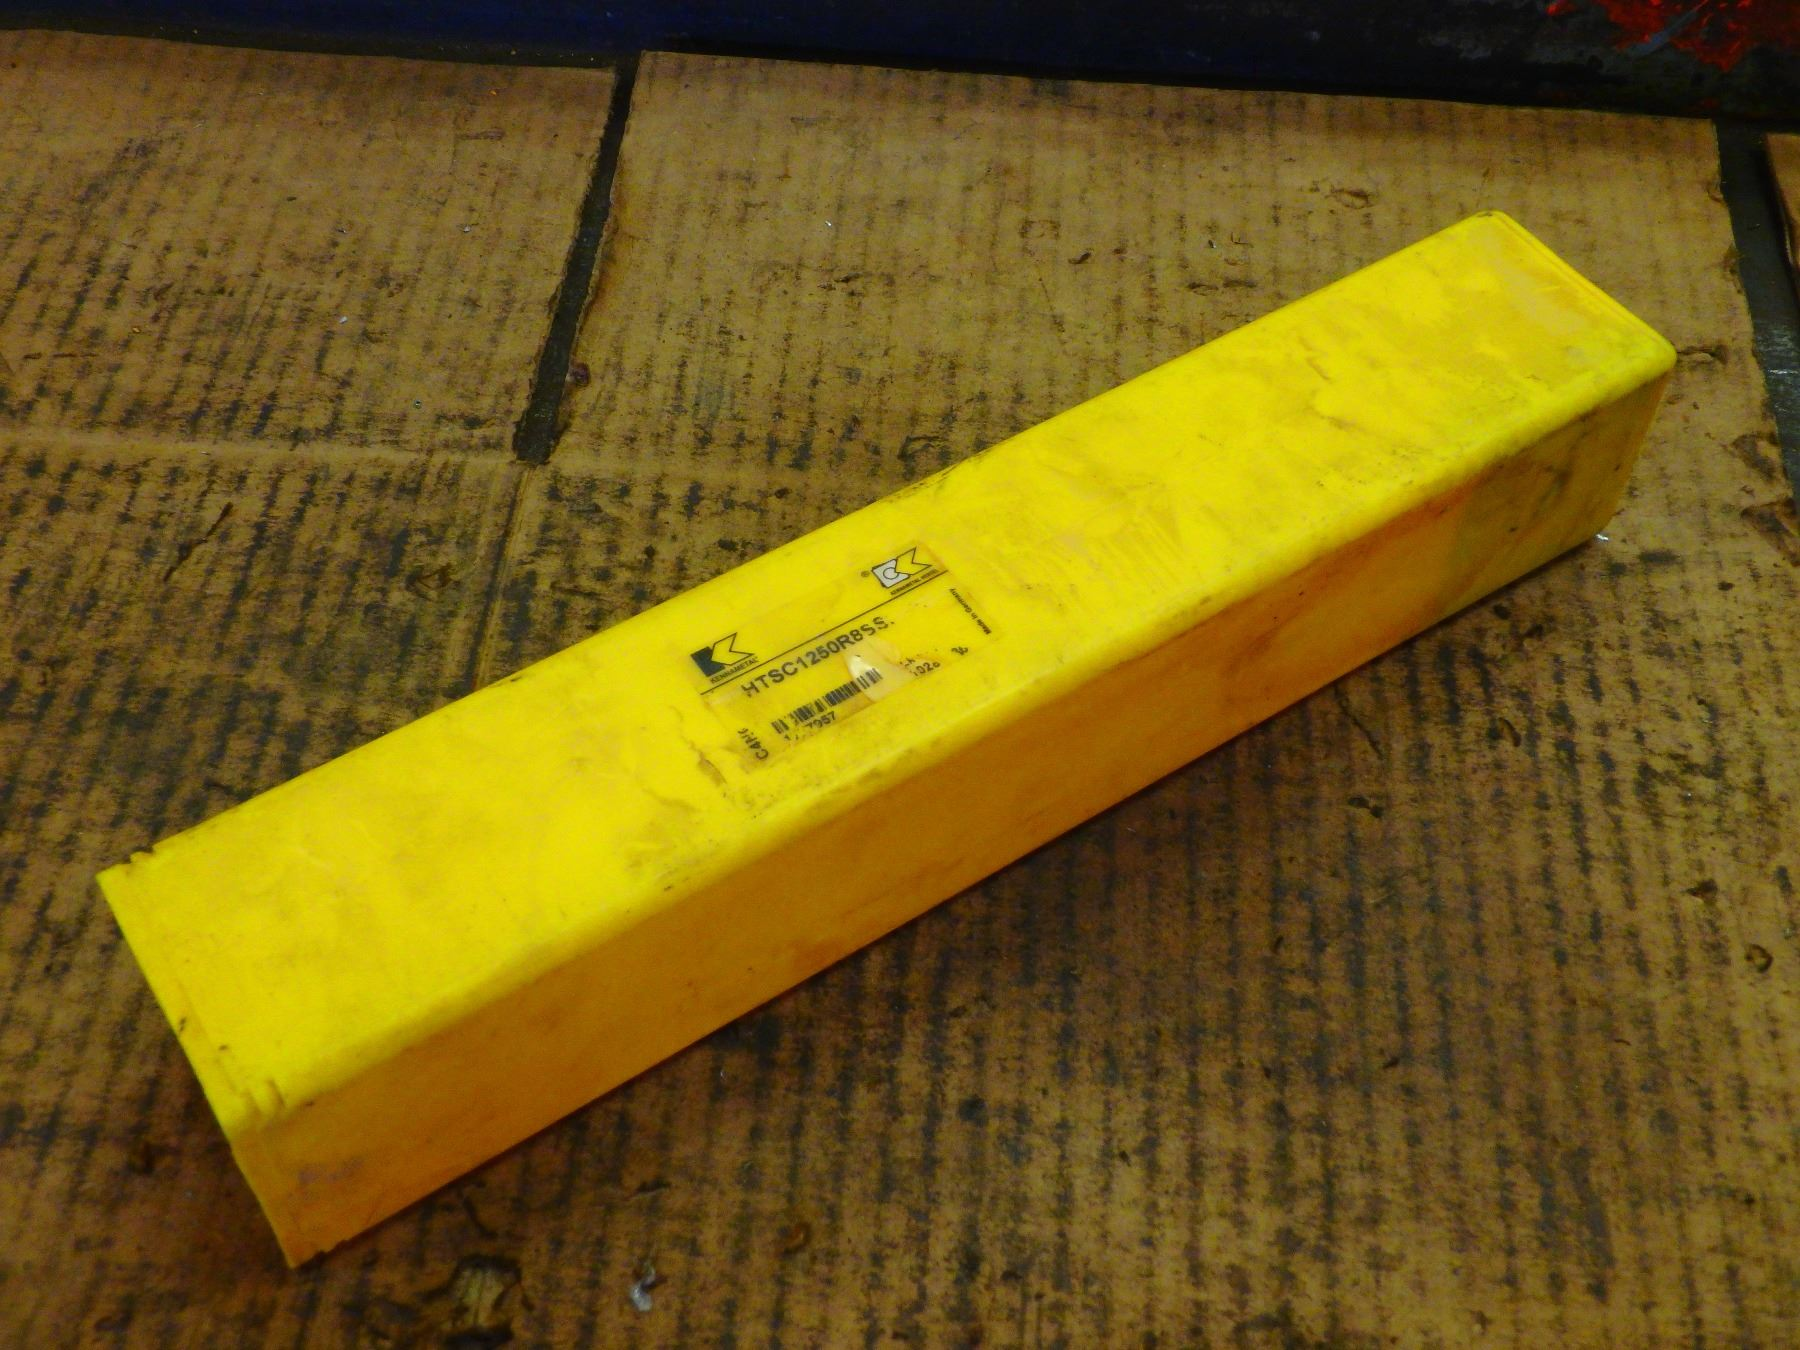 Kennametal Indexable Coolant Thru Deep Hole Drill, P/N: HTSC1250R8SSF150